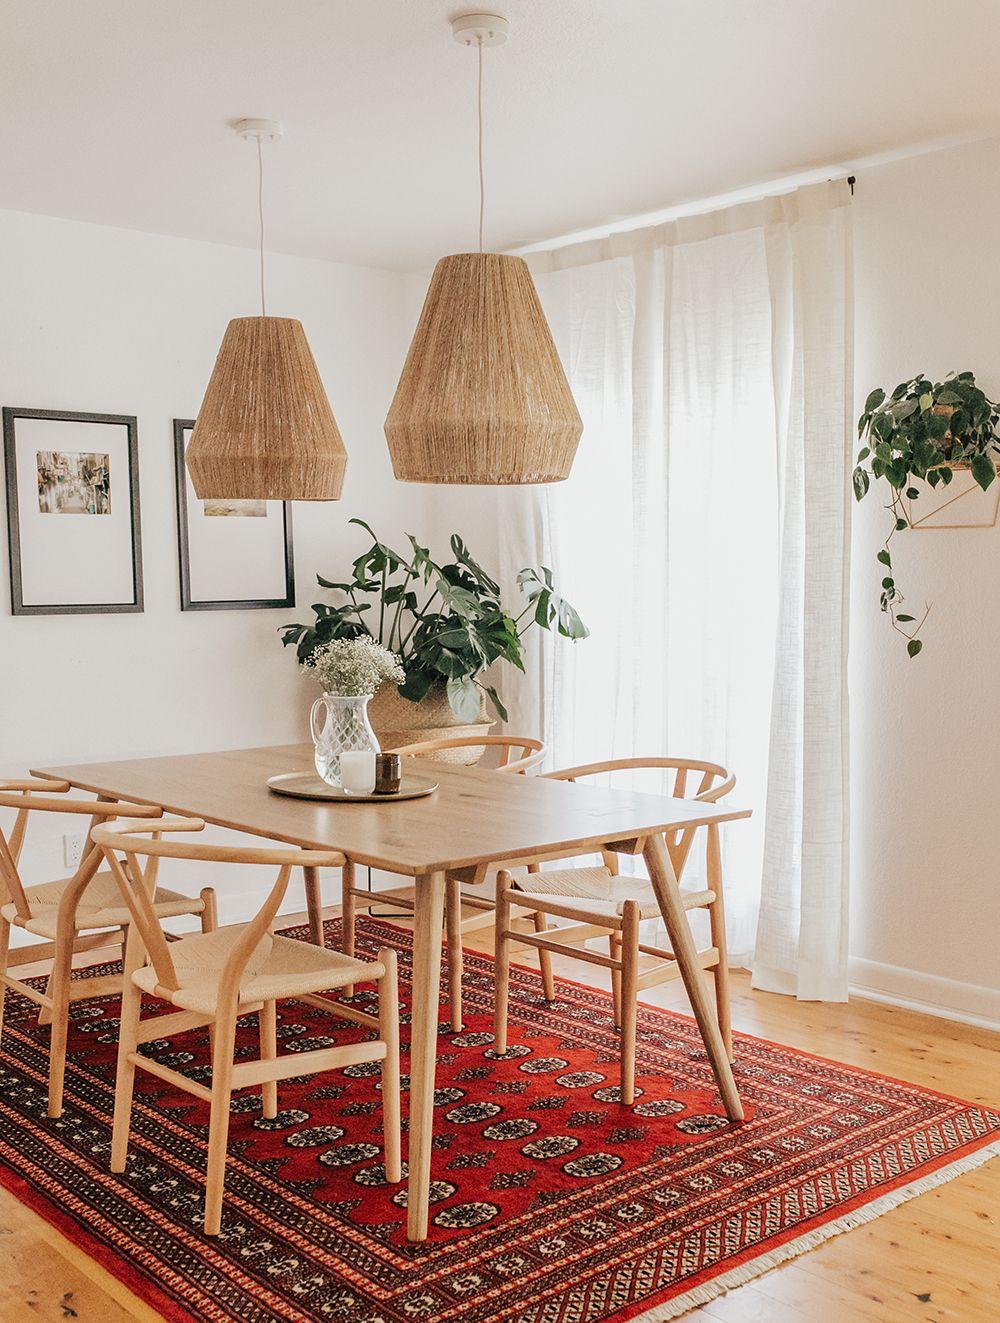 Modern Bungalow Dining Room Reveal Livvyland Bungalow Dining Room Vintage Dining Room Boho Dining Room Bungalow dining room decorating